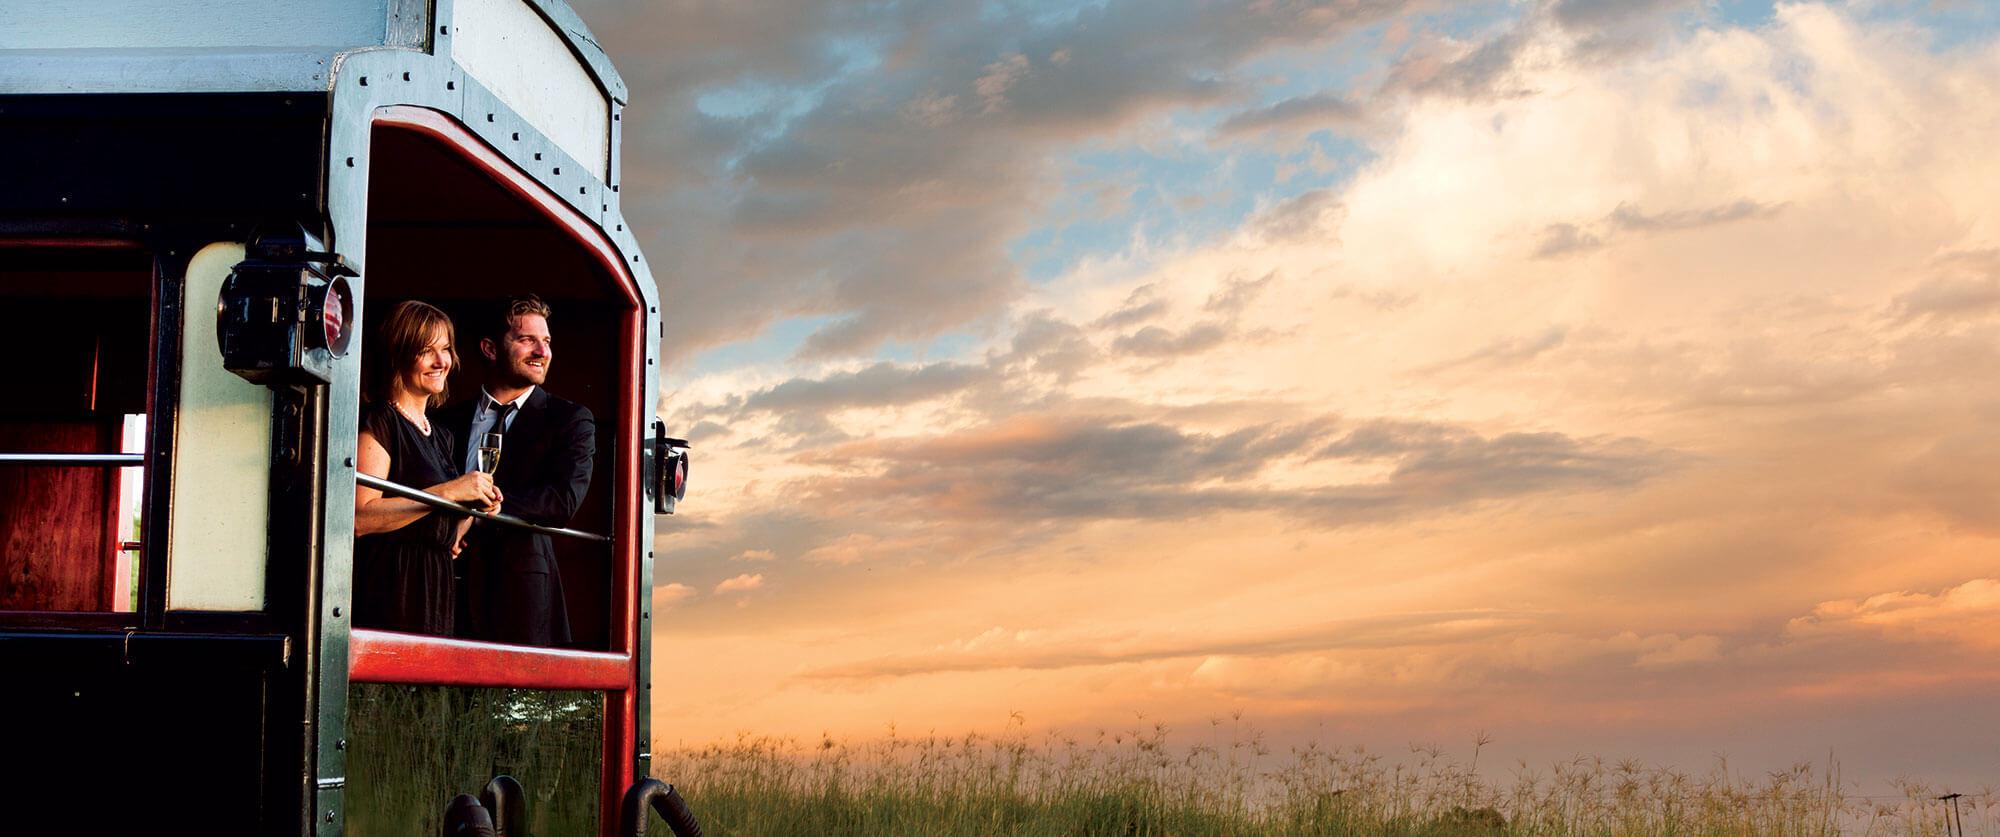 Rovos Rail Observation Car - Rovos Rail Golf Safari South Africa